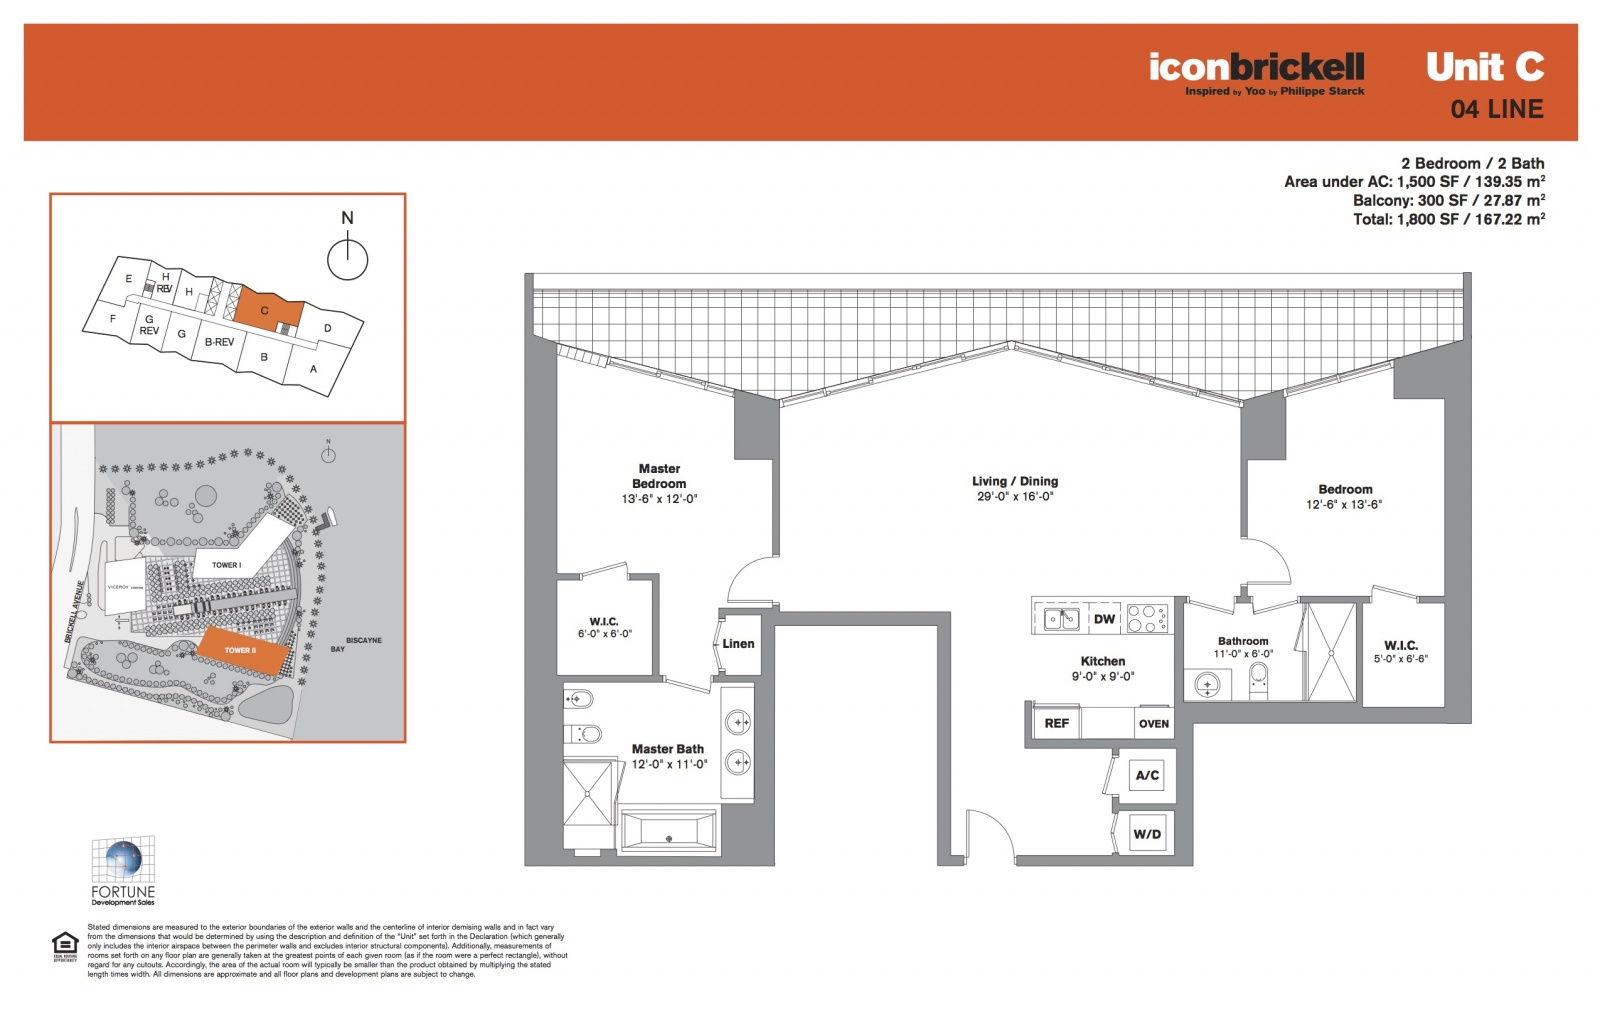 Icon Brickell Two, line 04 floor plan